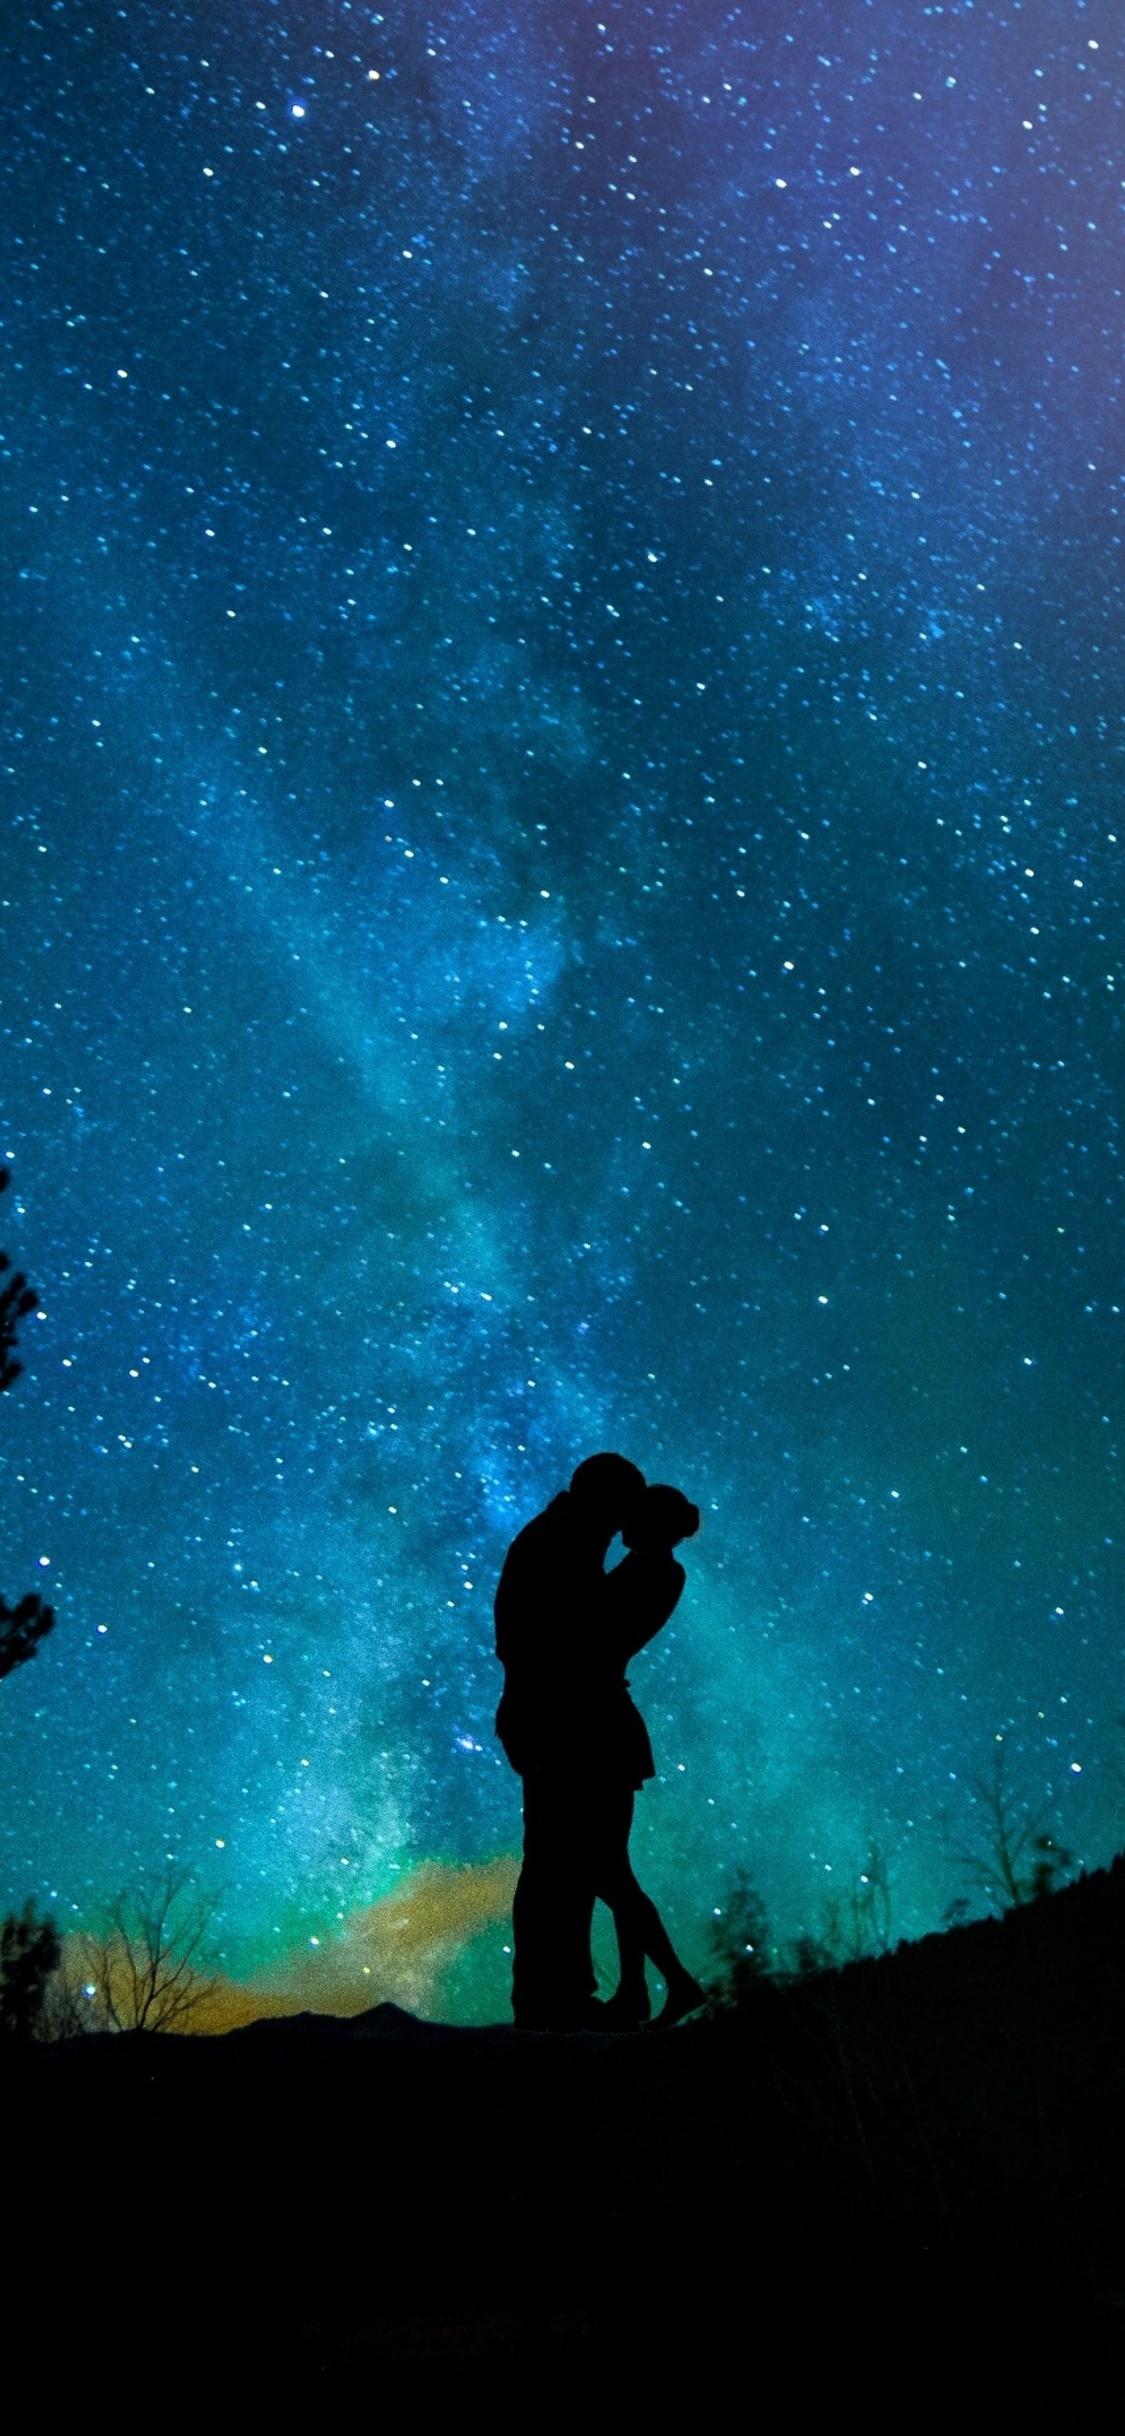 1125x2436 Lovers Night Sky Starry Sky Iphone Xs Iphone 10